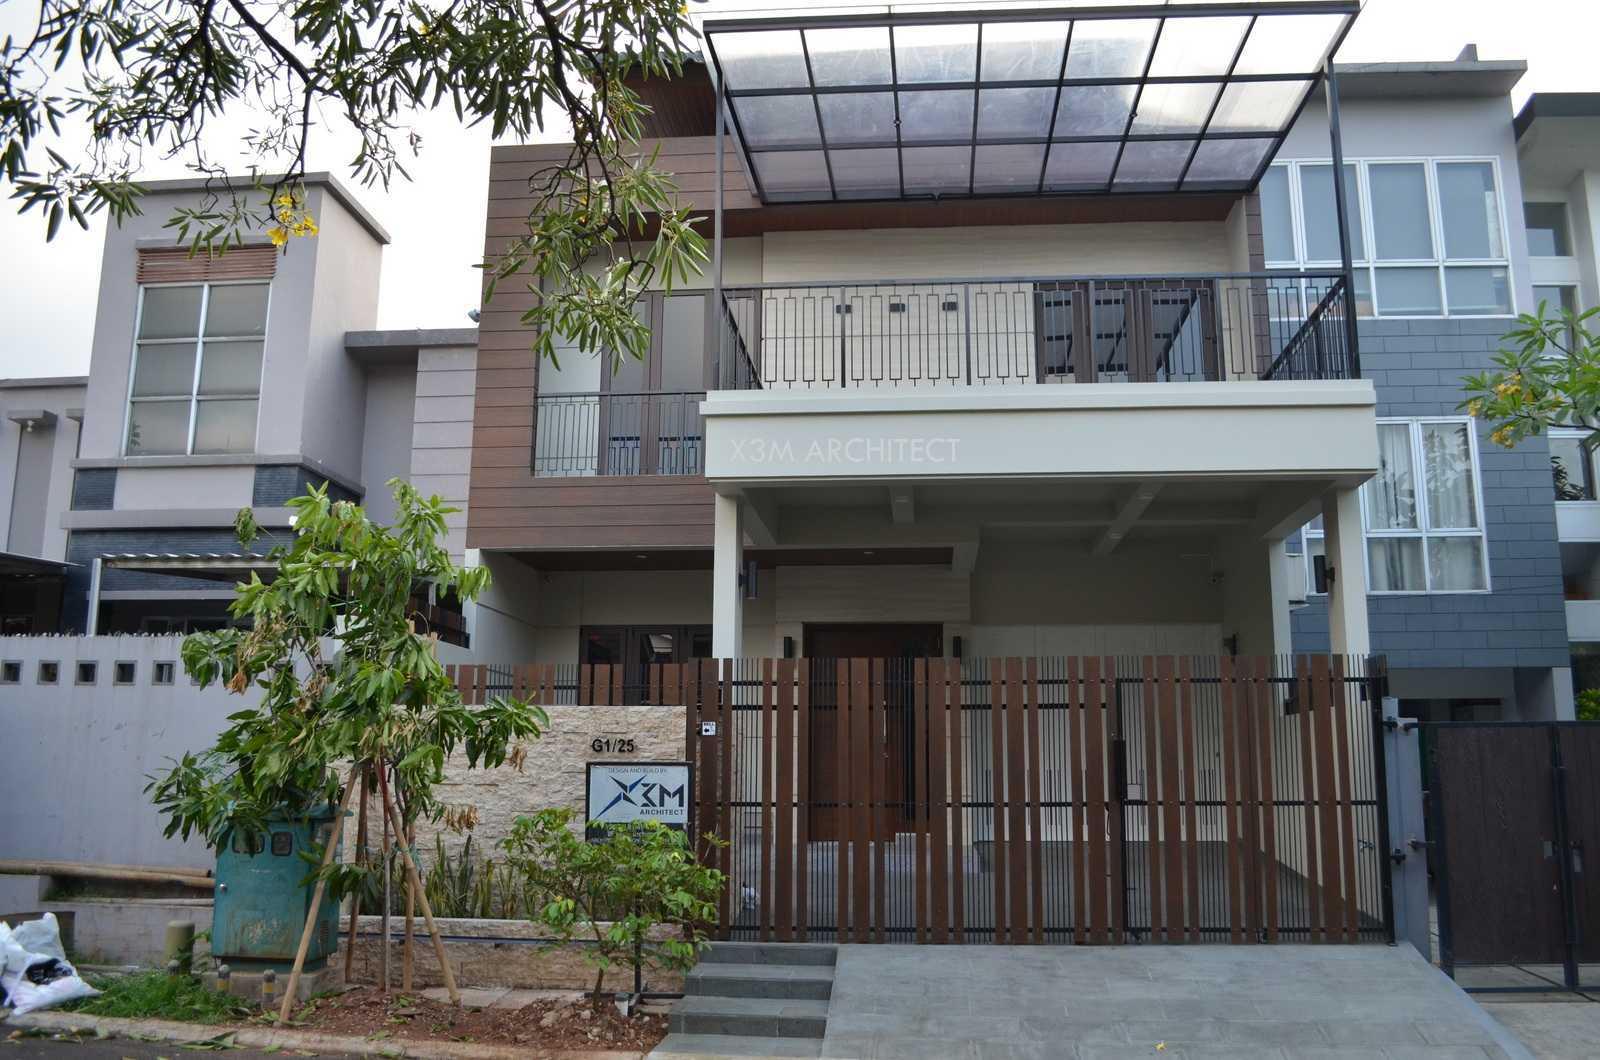 X3M Architects Gl Residence Berjaya Asia Bsd Office 2Th Floor Jl. Griya Loka Raya Bj-26, Rw. Buntu, Kec. Serpong, Kota Tangerang Selatan, Banten 15318, Indonesia Berjaya Asia Bsd Office 2Th Floor Jl. Griya Loka Raya Bj-26, Rw. Buntu, Kec. Serpong, Kota Tangerang Selatan, Banten 15318, Indonesia X3M-Architects-Gl-Residence  101566